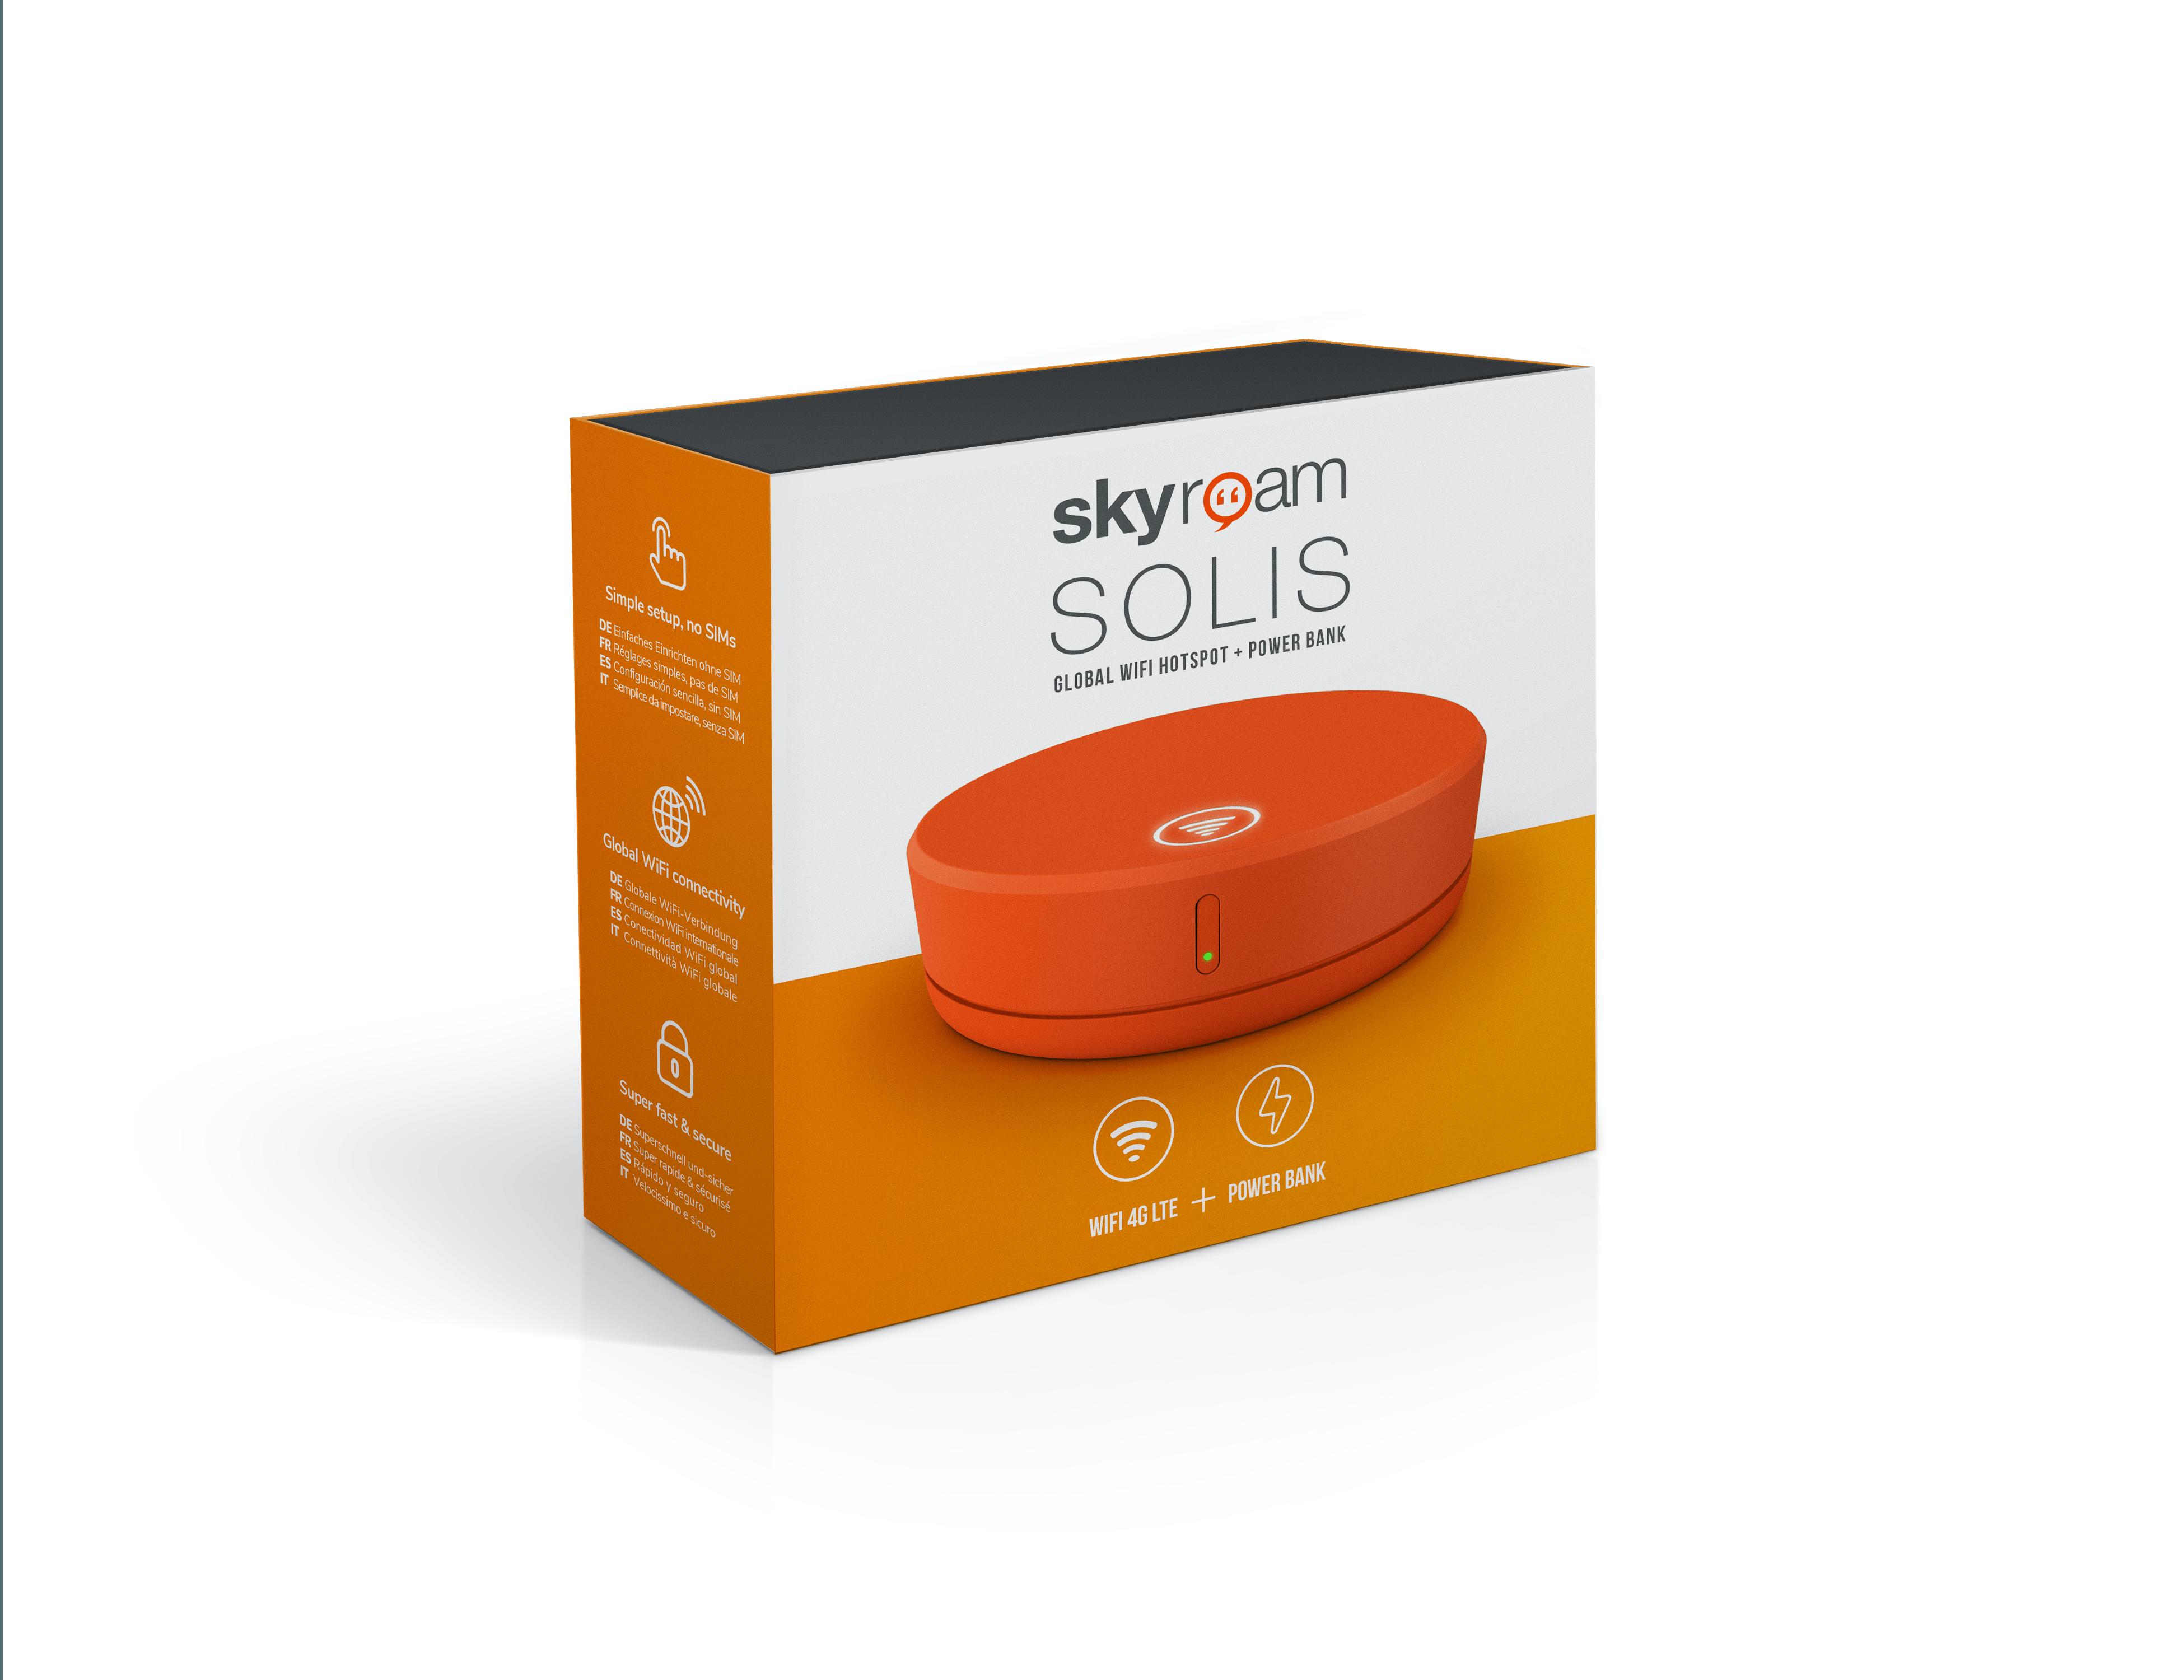 Skyroam Solis Mobile WiFi Hotspot & Power Bank (Unlimited